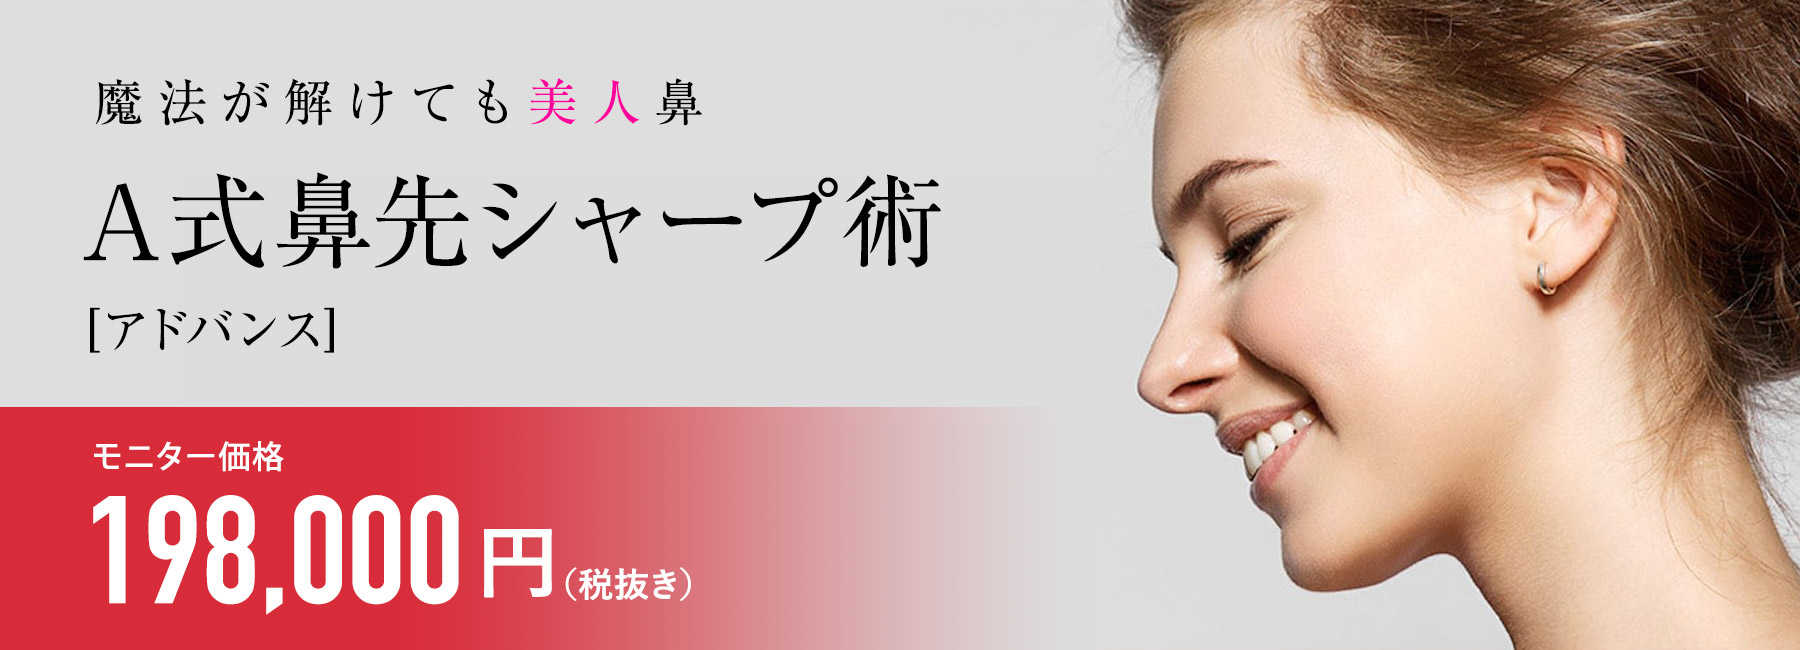 A式鼻先シャープ術